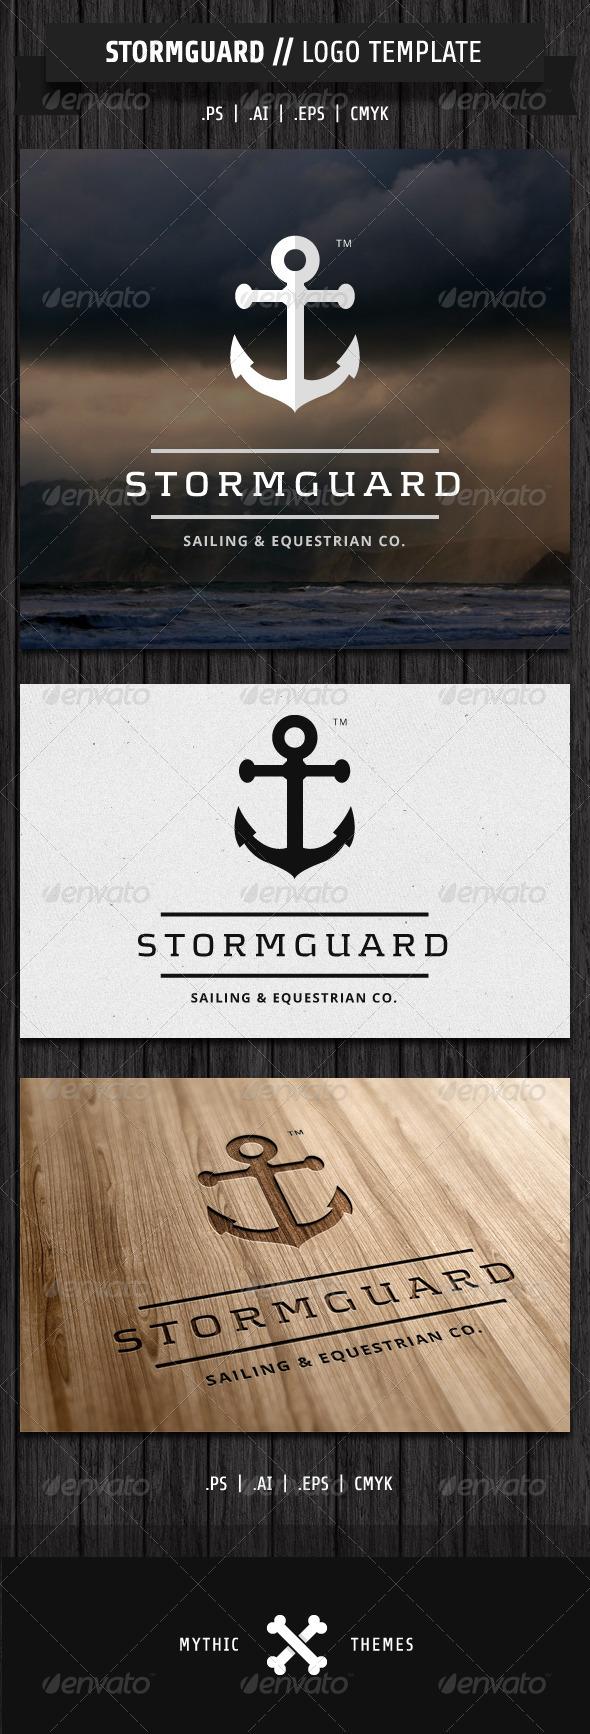 GraphicRiver Stormguard Sailing & Marine themed logo 2324225